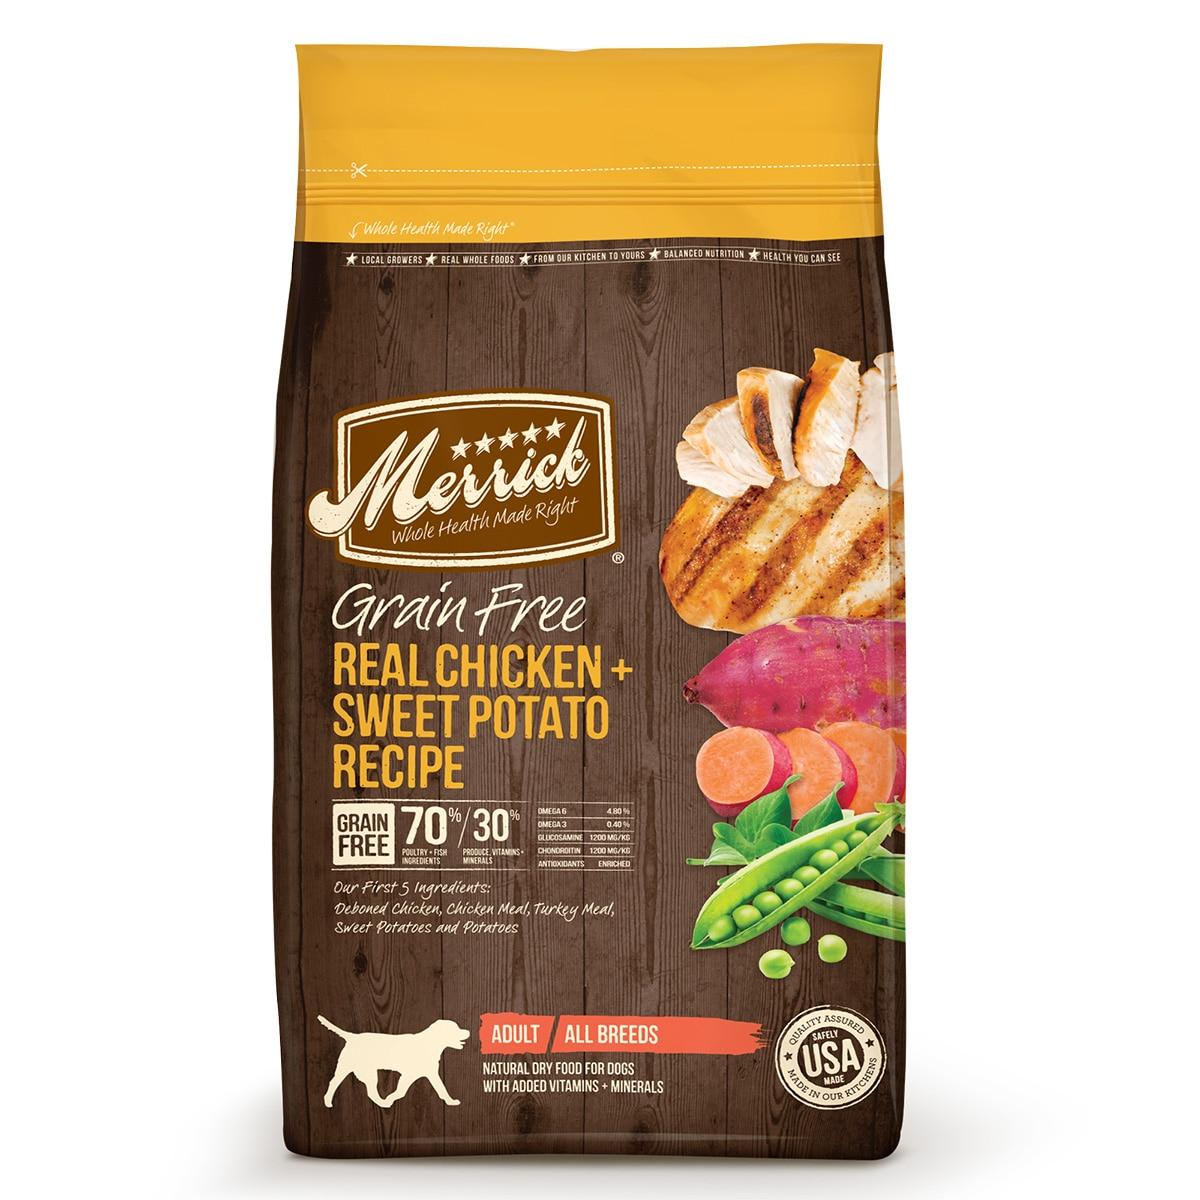 Merrick® Grain Free Real Chicken + Sweet Potato Recipe Dry Dog Food